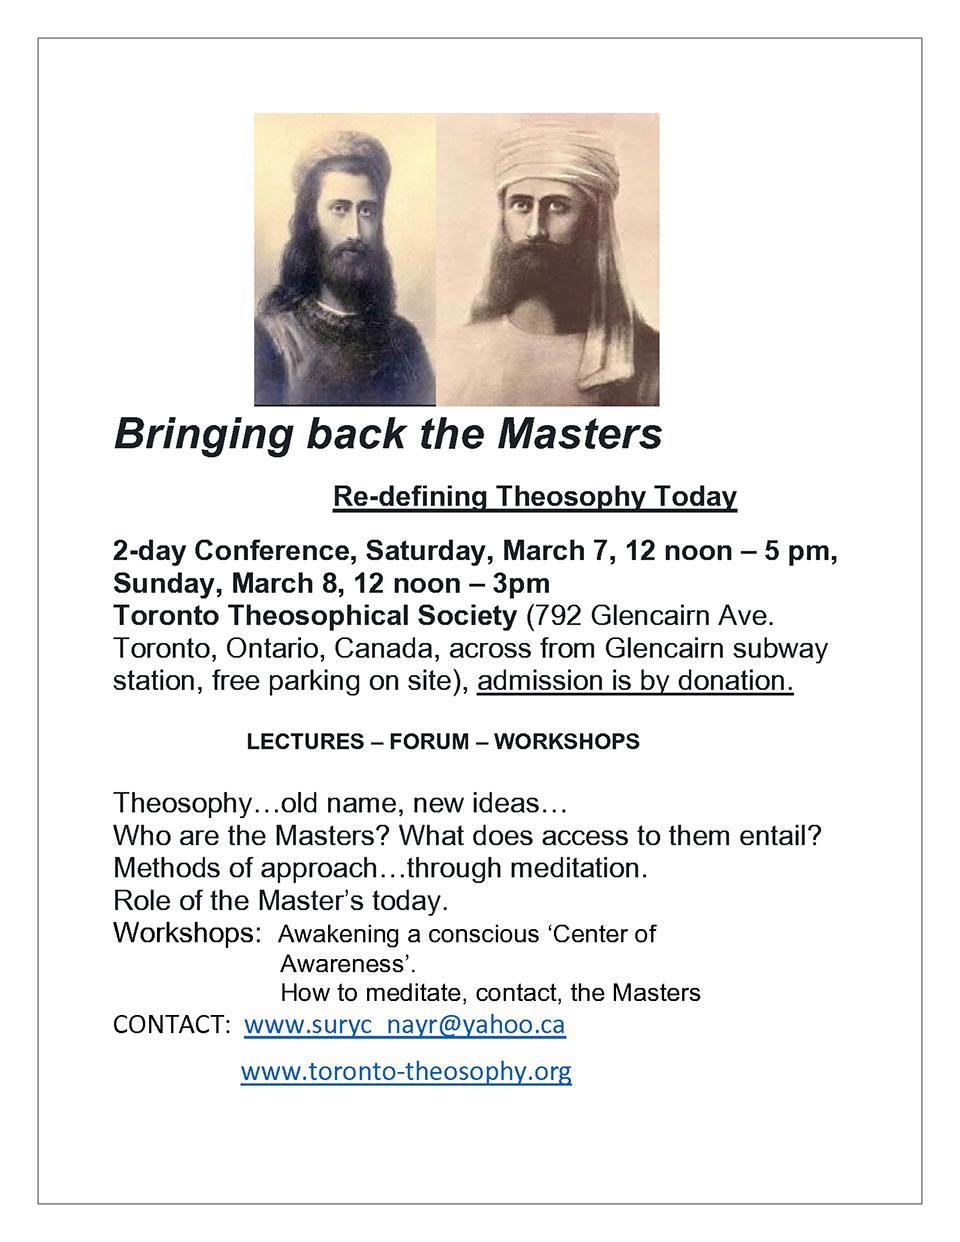 Bringing back the masters flyer